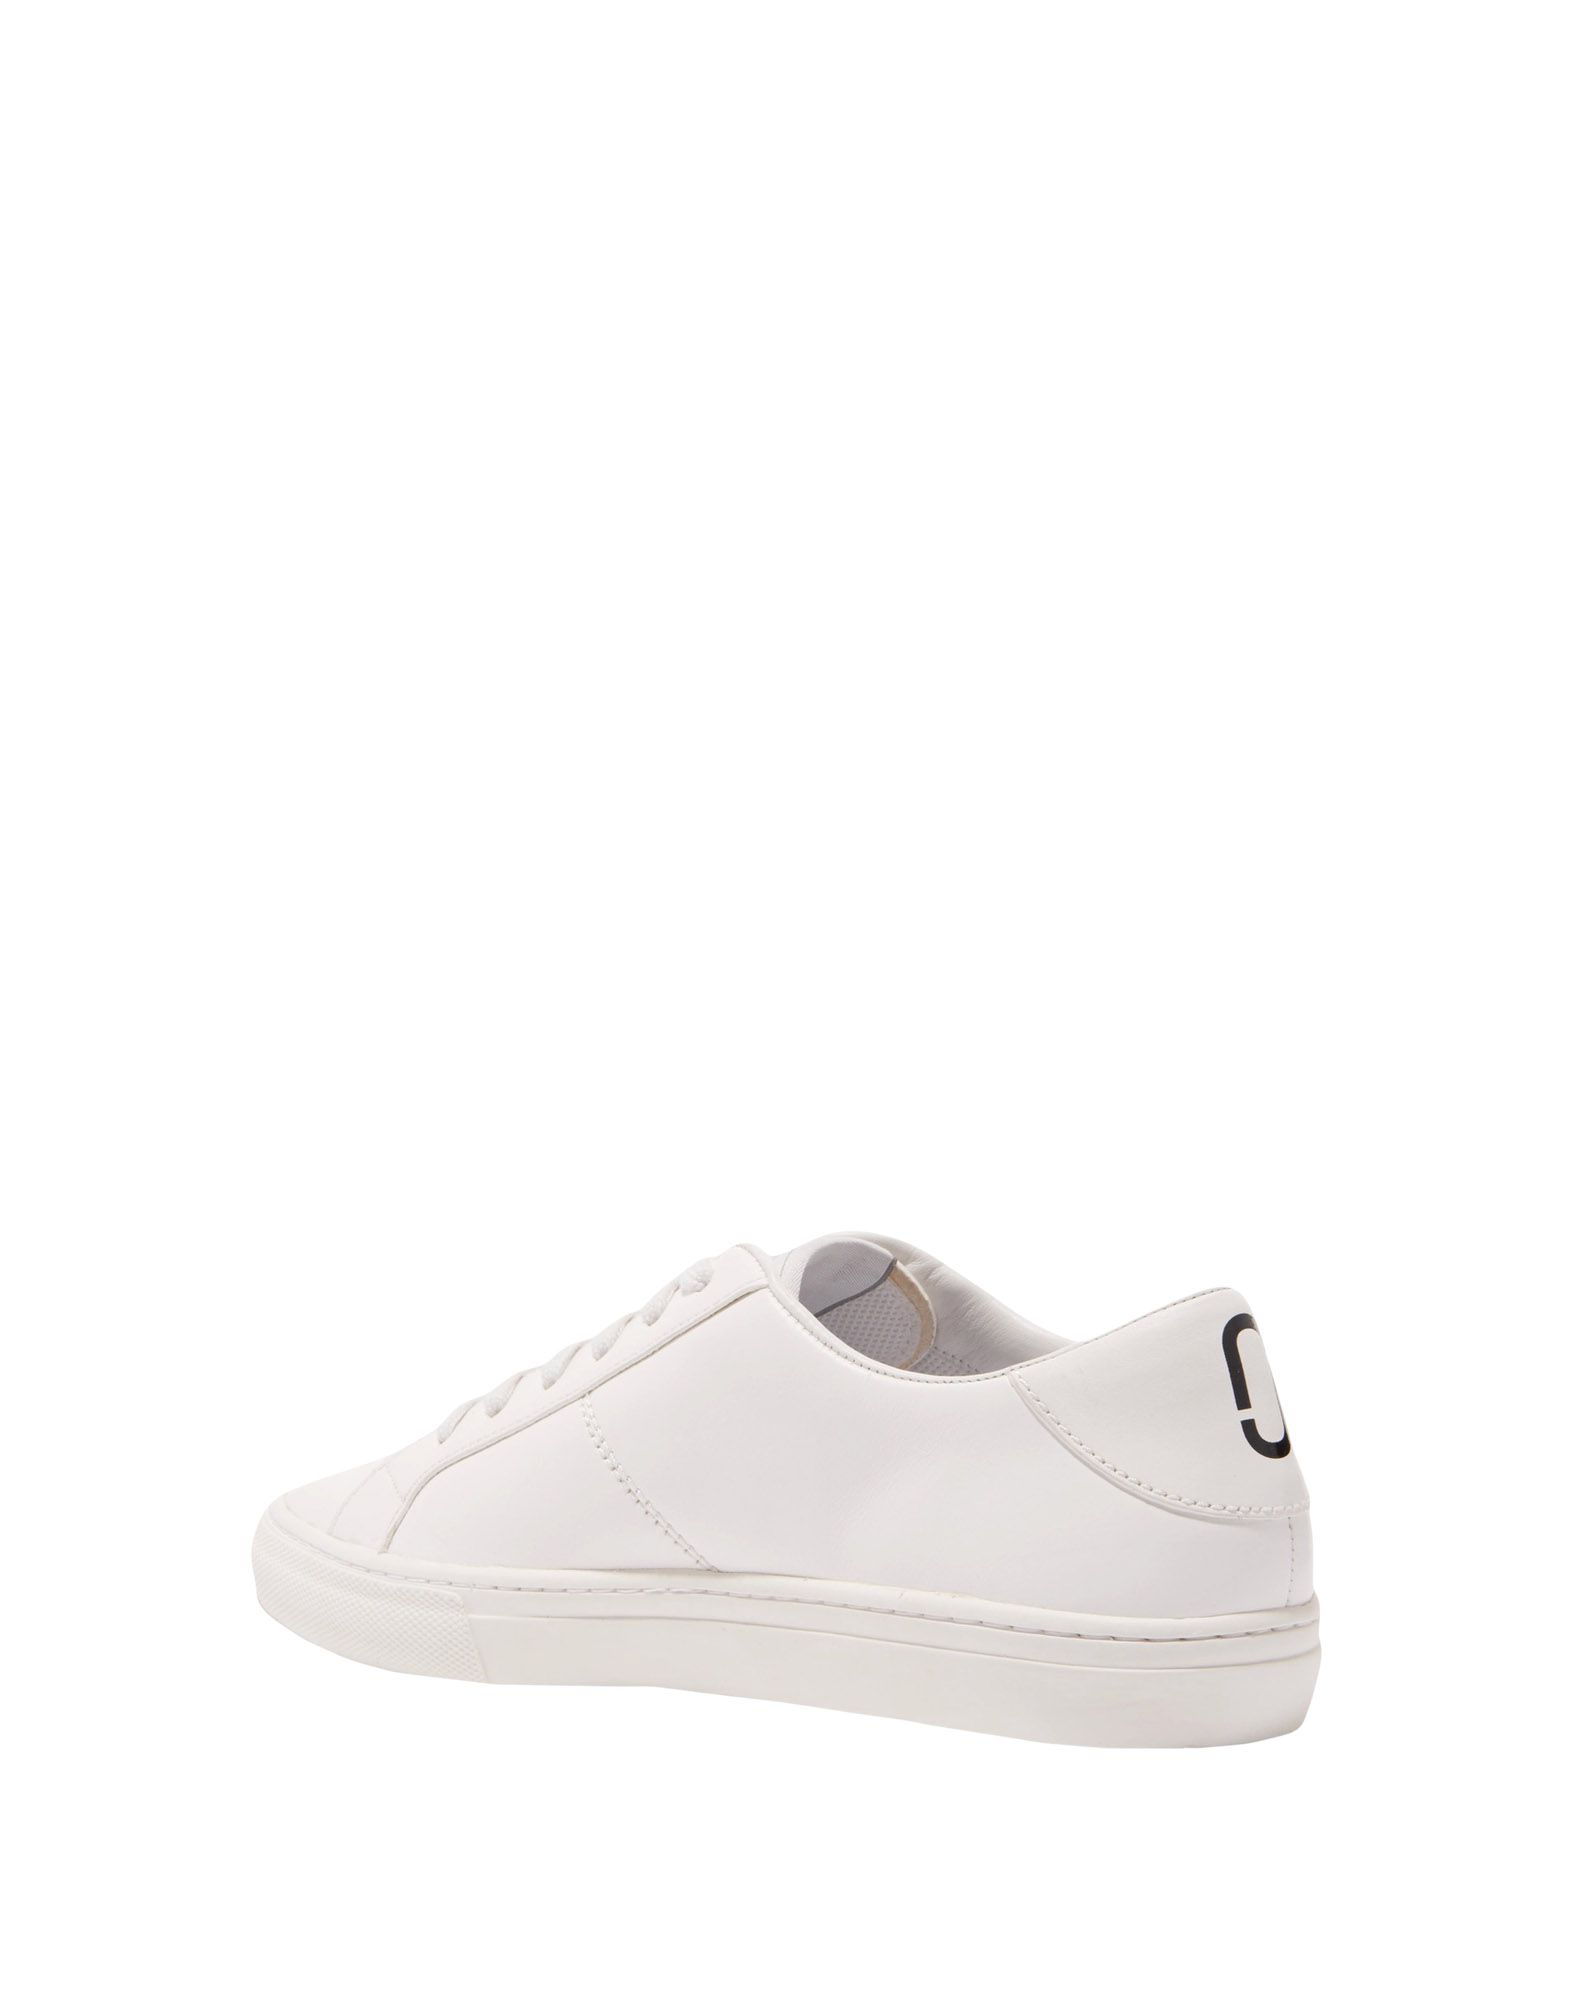 Marc Jacobs Sneakers Damen    11527262ES Neue Schuhe 3050be